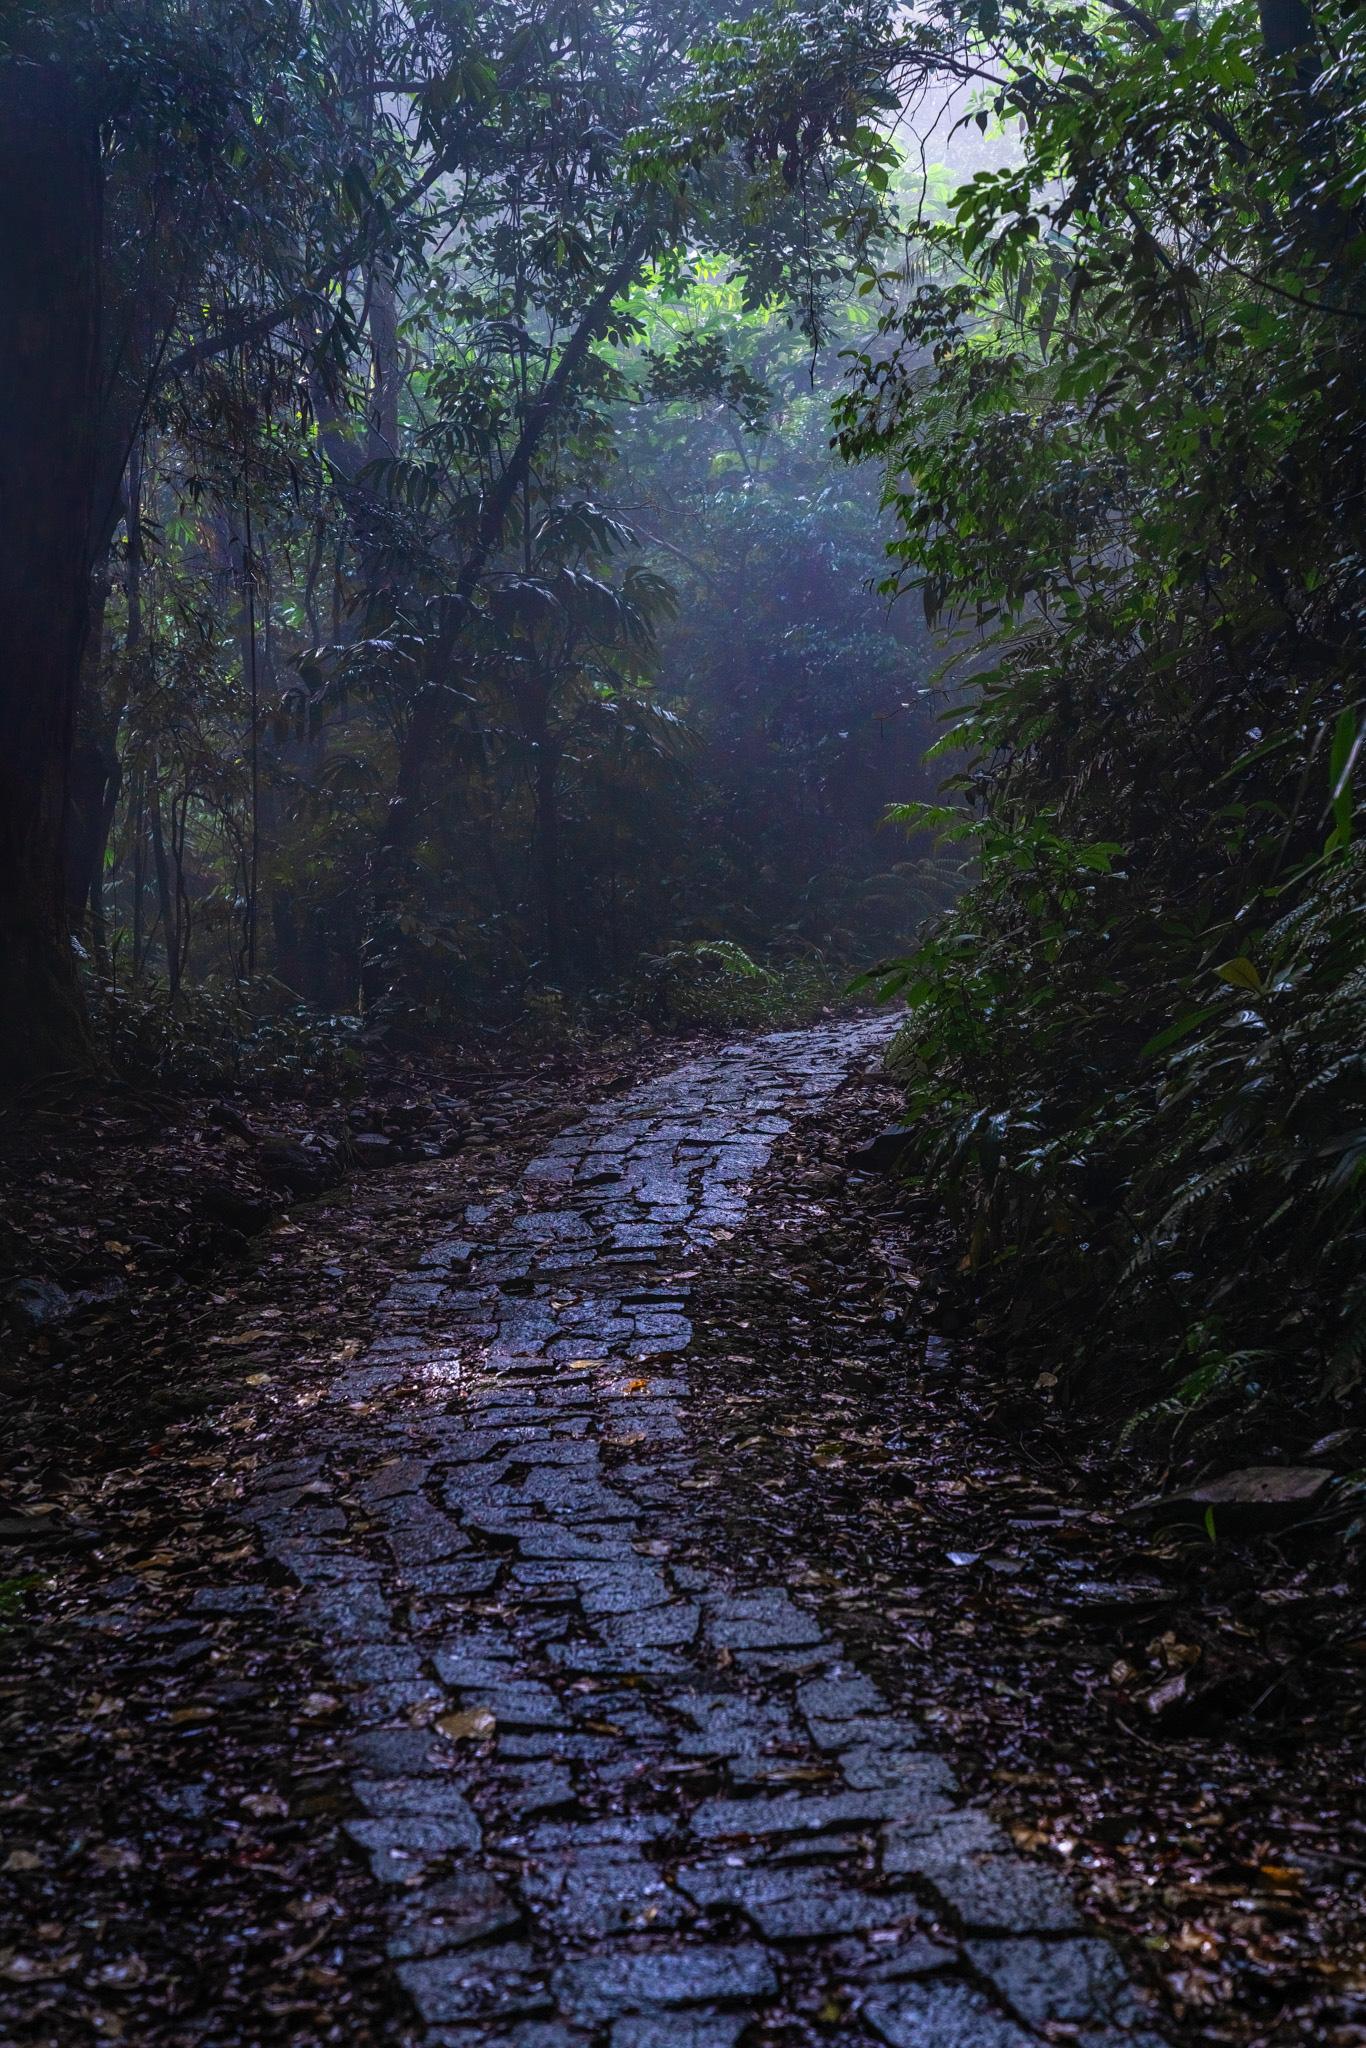 A mountain trail to the Bach Ma peak in Thua Thien-Hue Province, Vietnam. Photo: Tran Luu Anh Tuan / Tuoi Tre